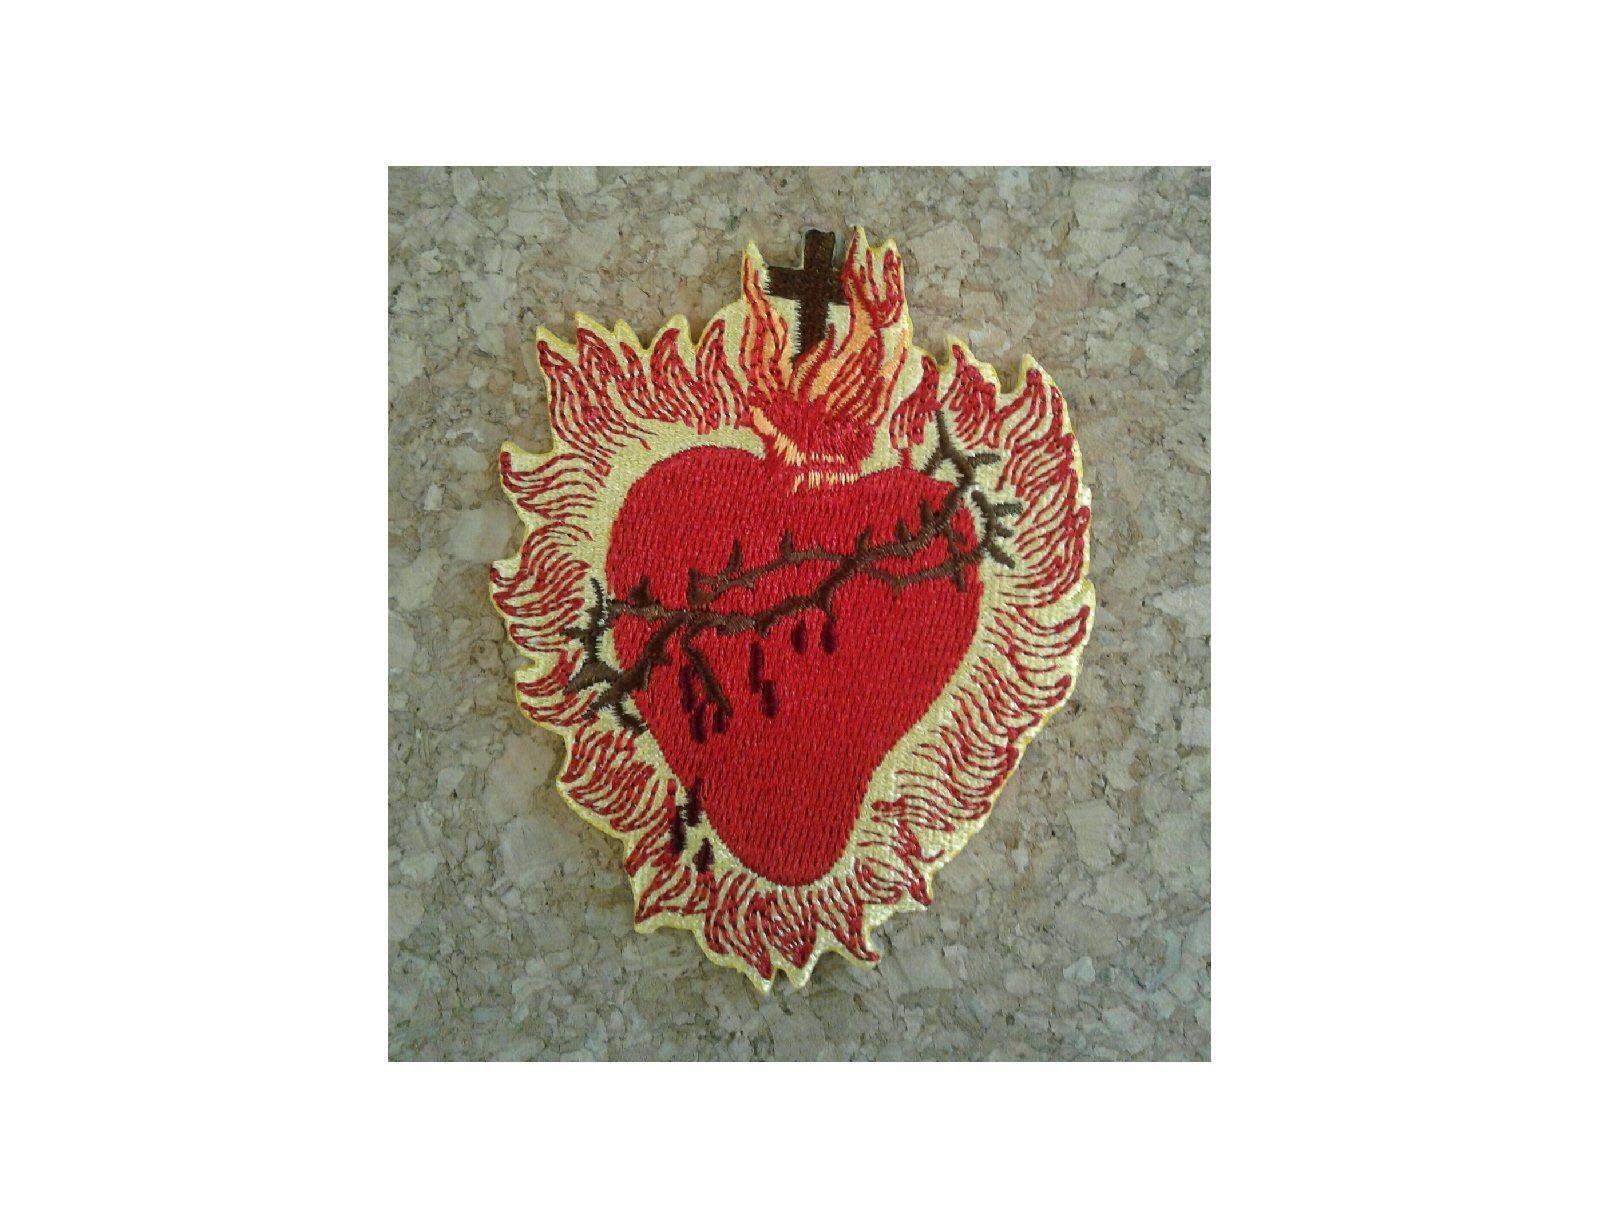 Sacred heart jesus church catholic christian embroidered